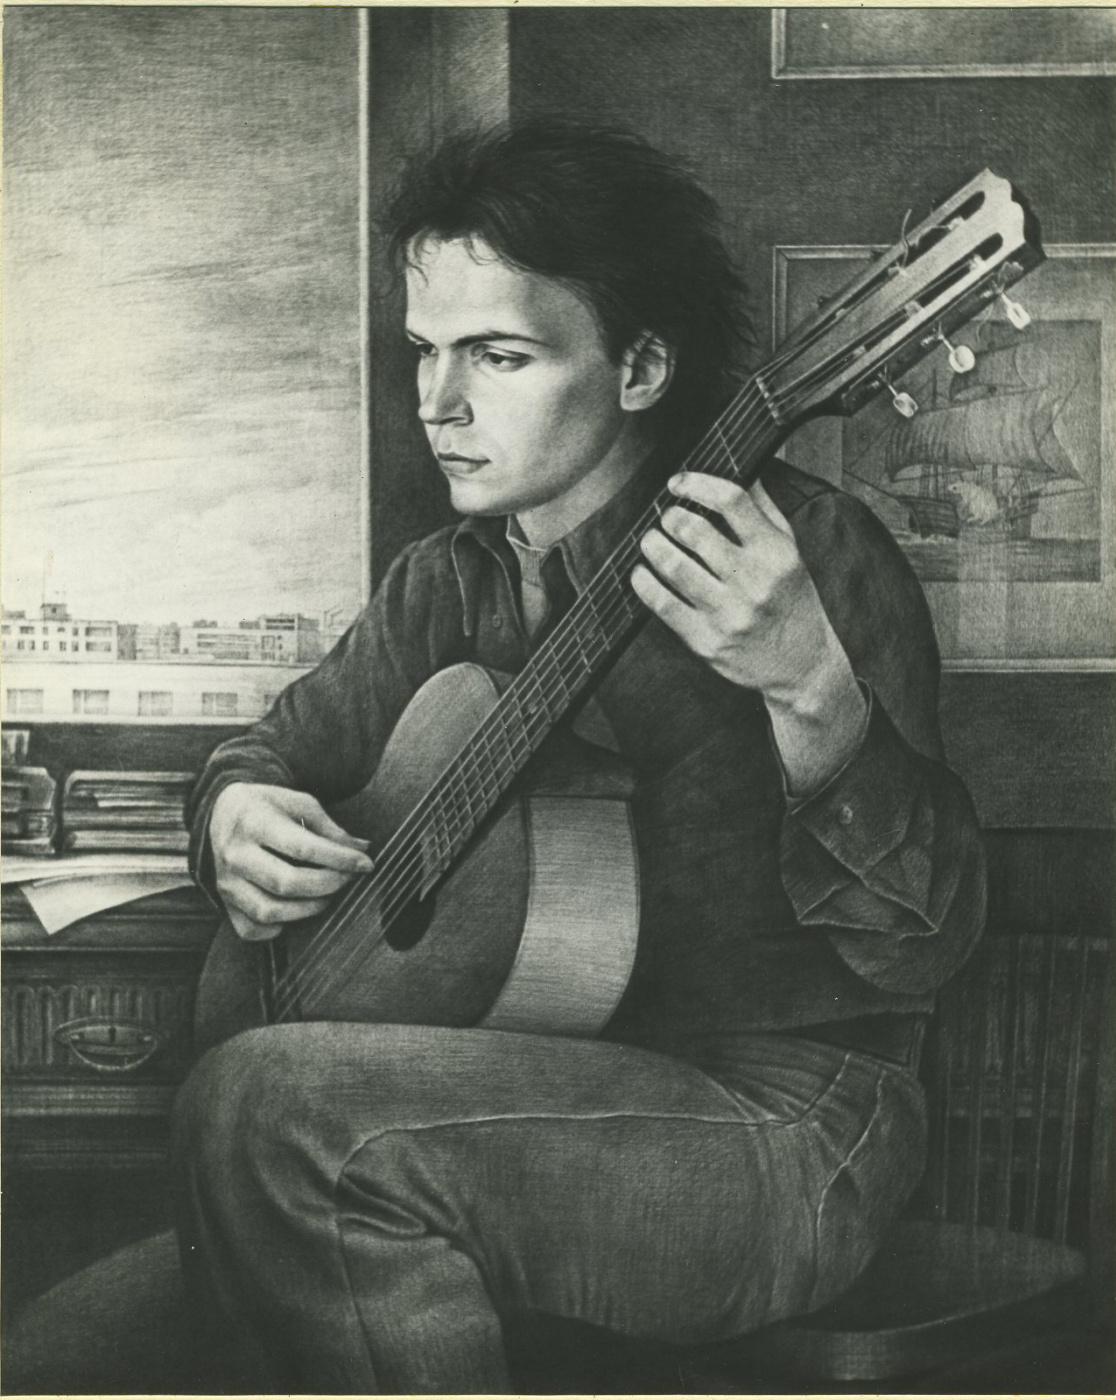 Alexander Vasilyevich Lozenko. Composer Nikita Koshkin